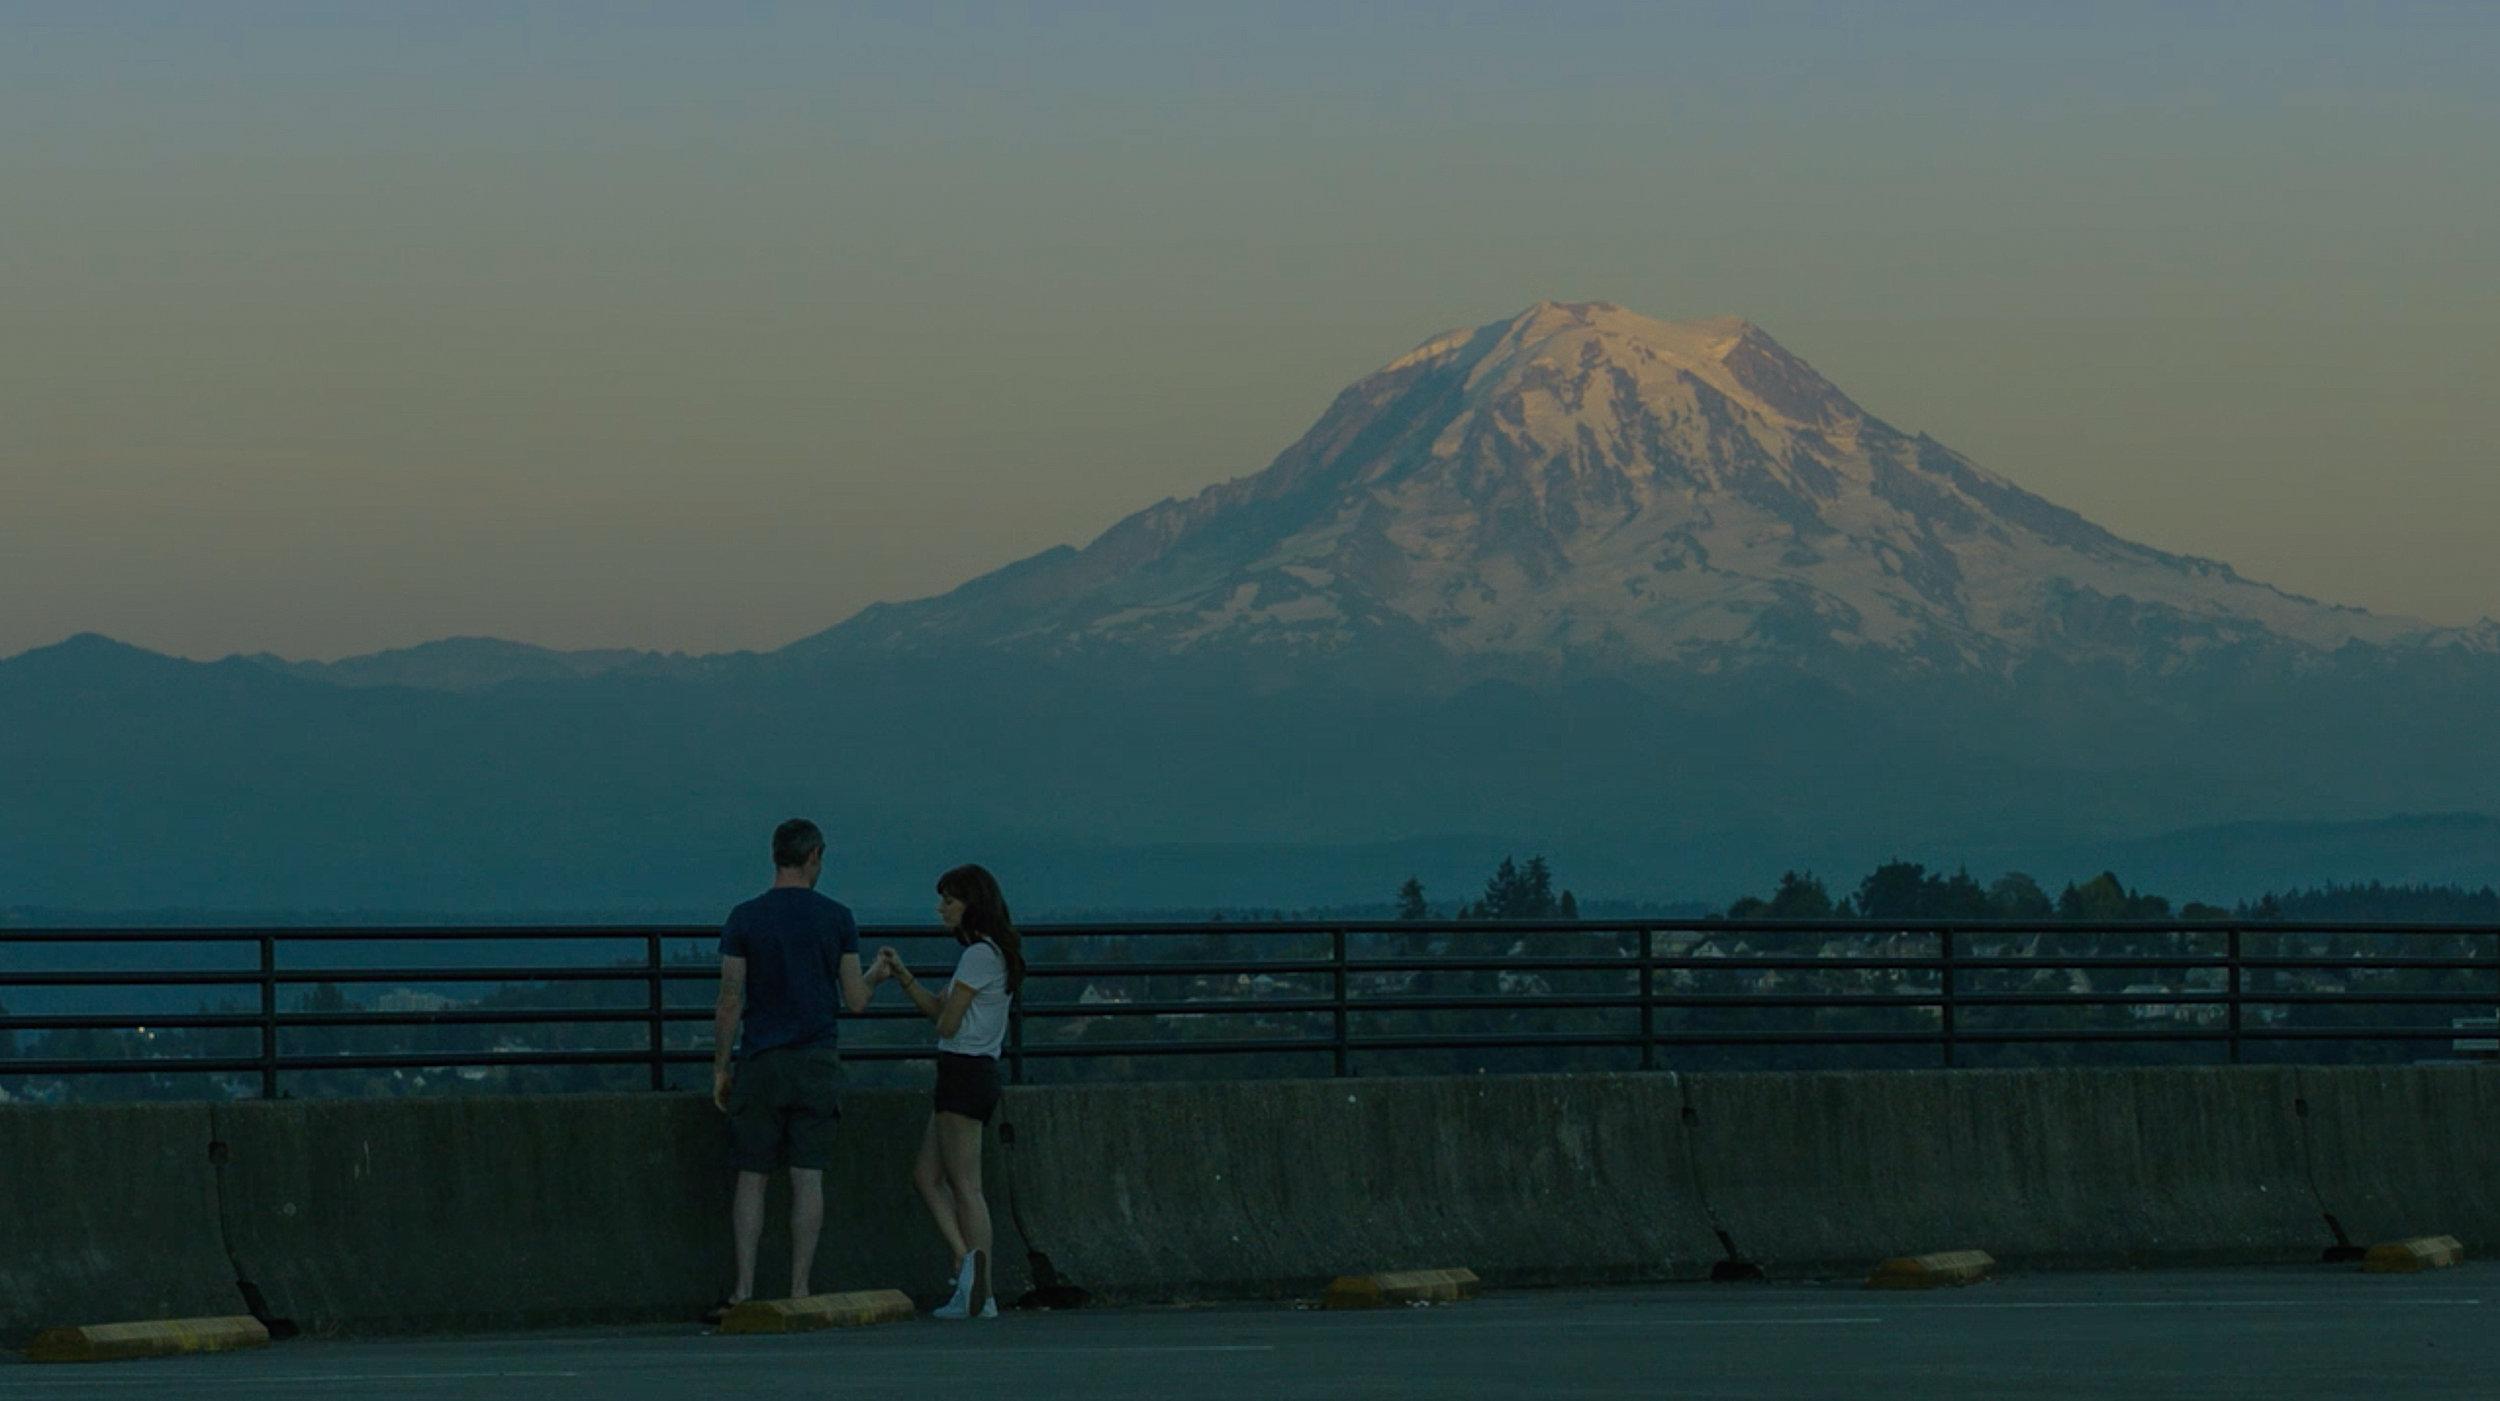 Heartthrob      feature film | 2017  Director: Chris Sivertson  Camera: Arri Alexa